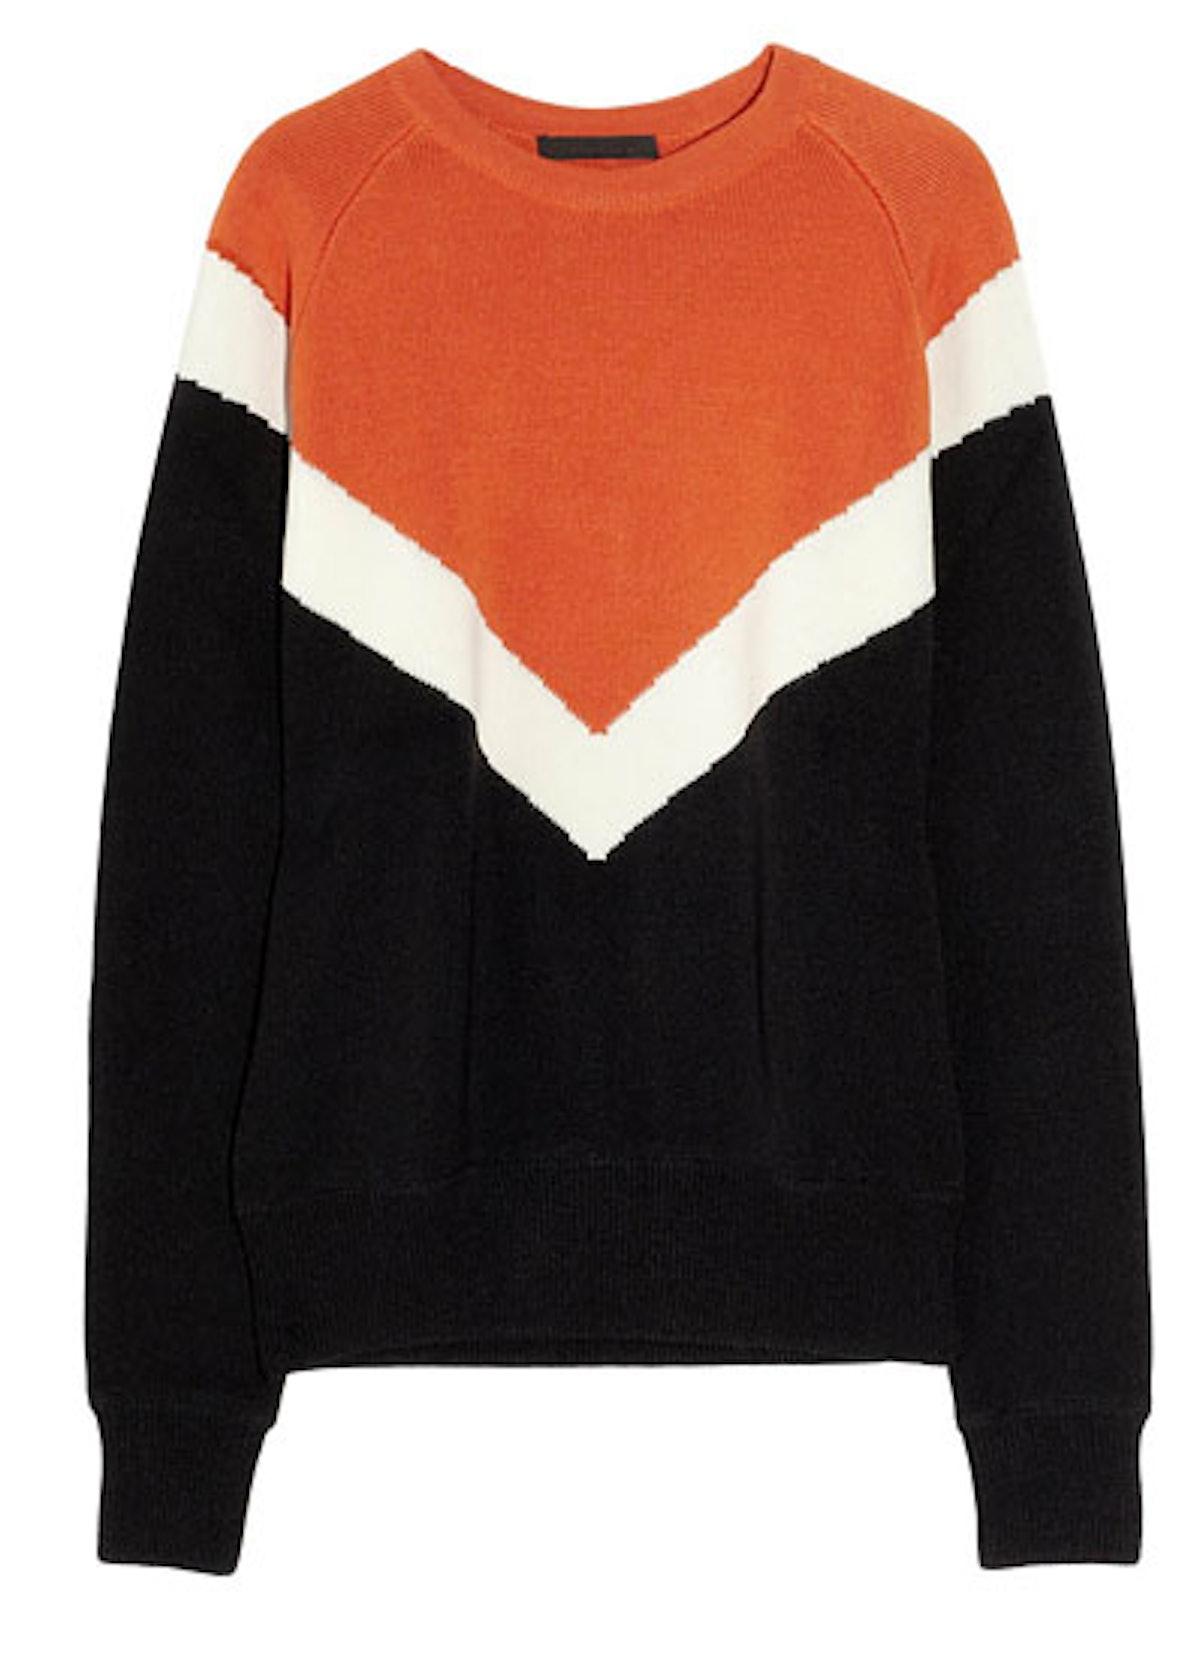 fass-graphic-knits-04-v.jpg